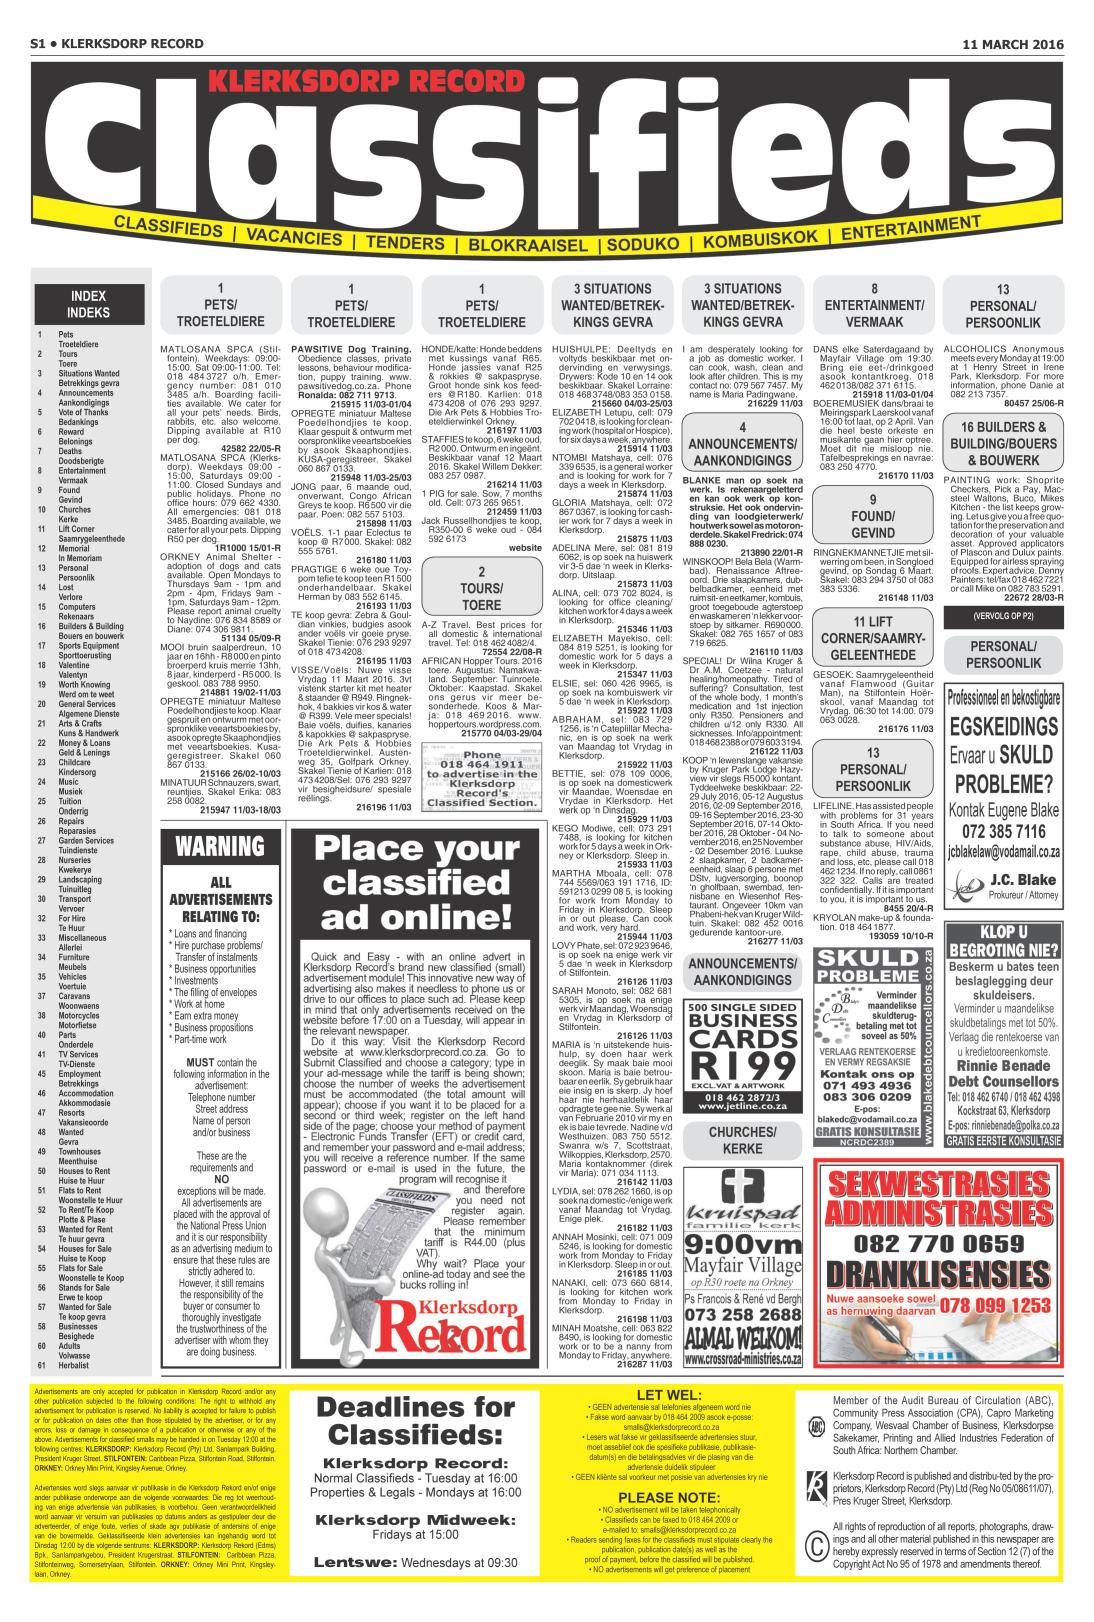 www.salocalnewspapers.co.za - /newspapers/klerksdorprecord ...